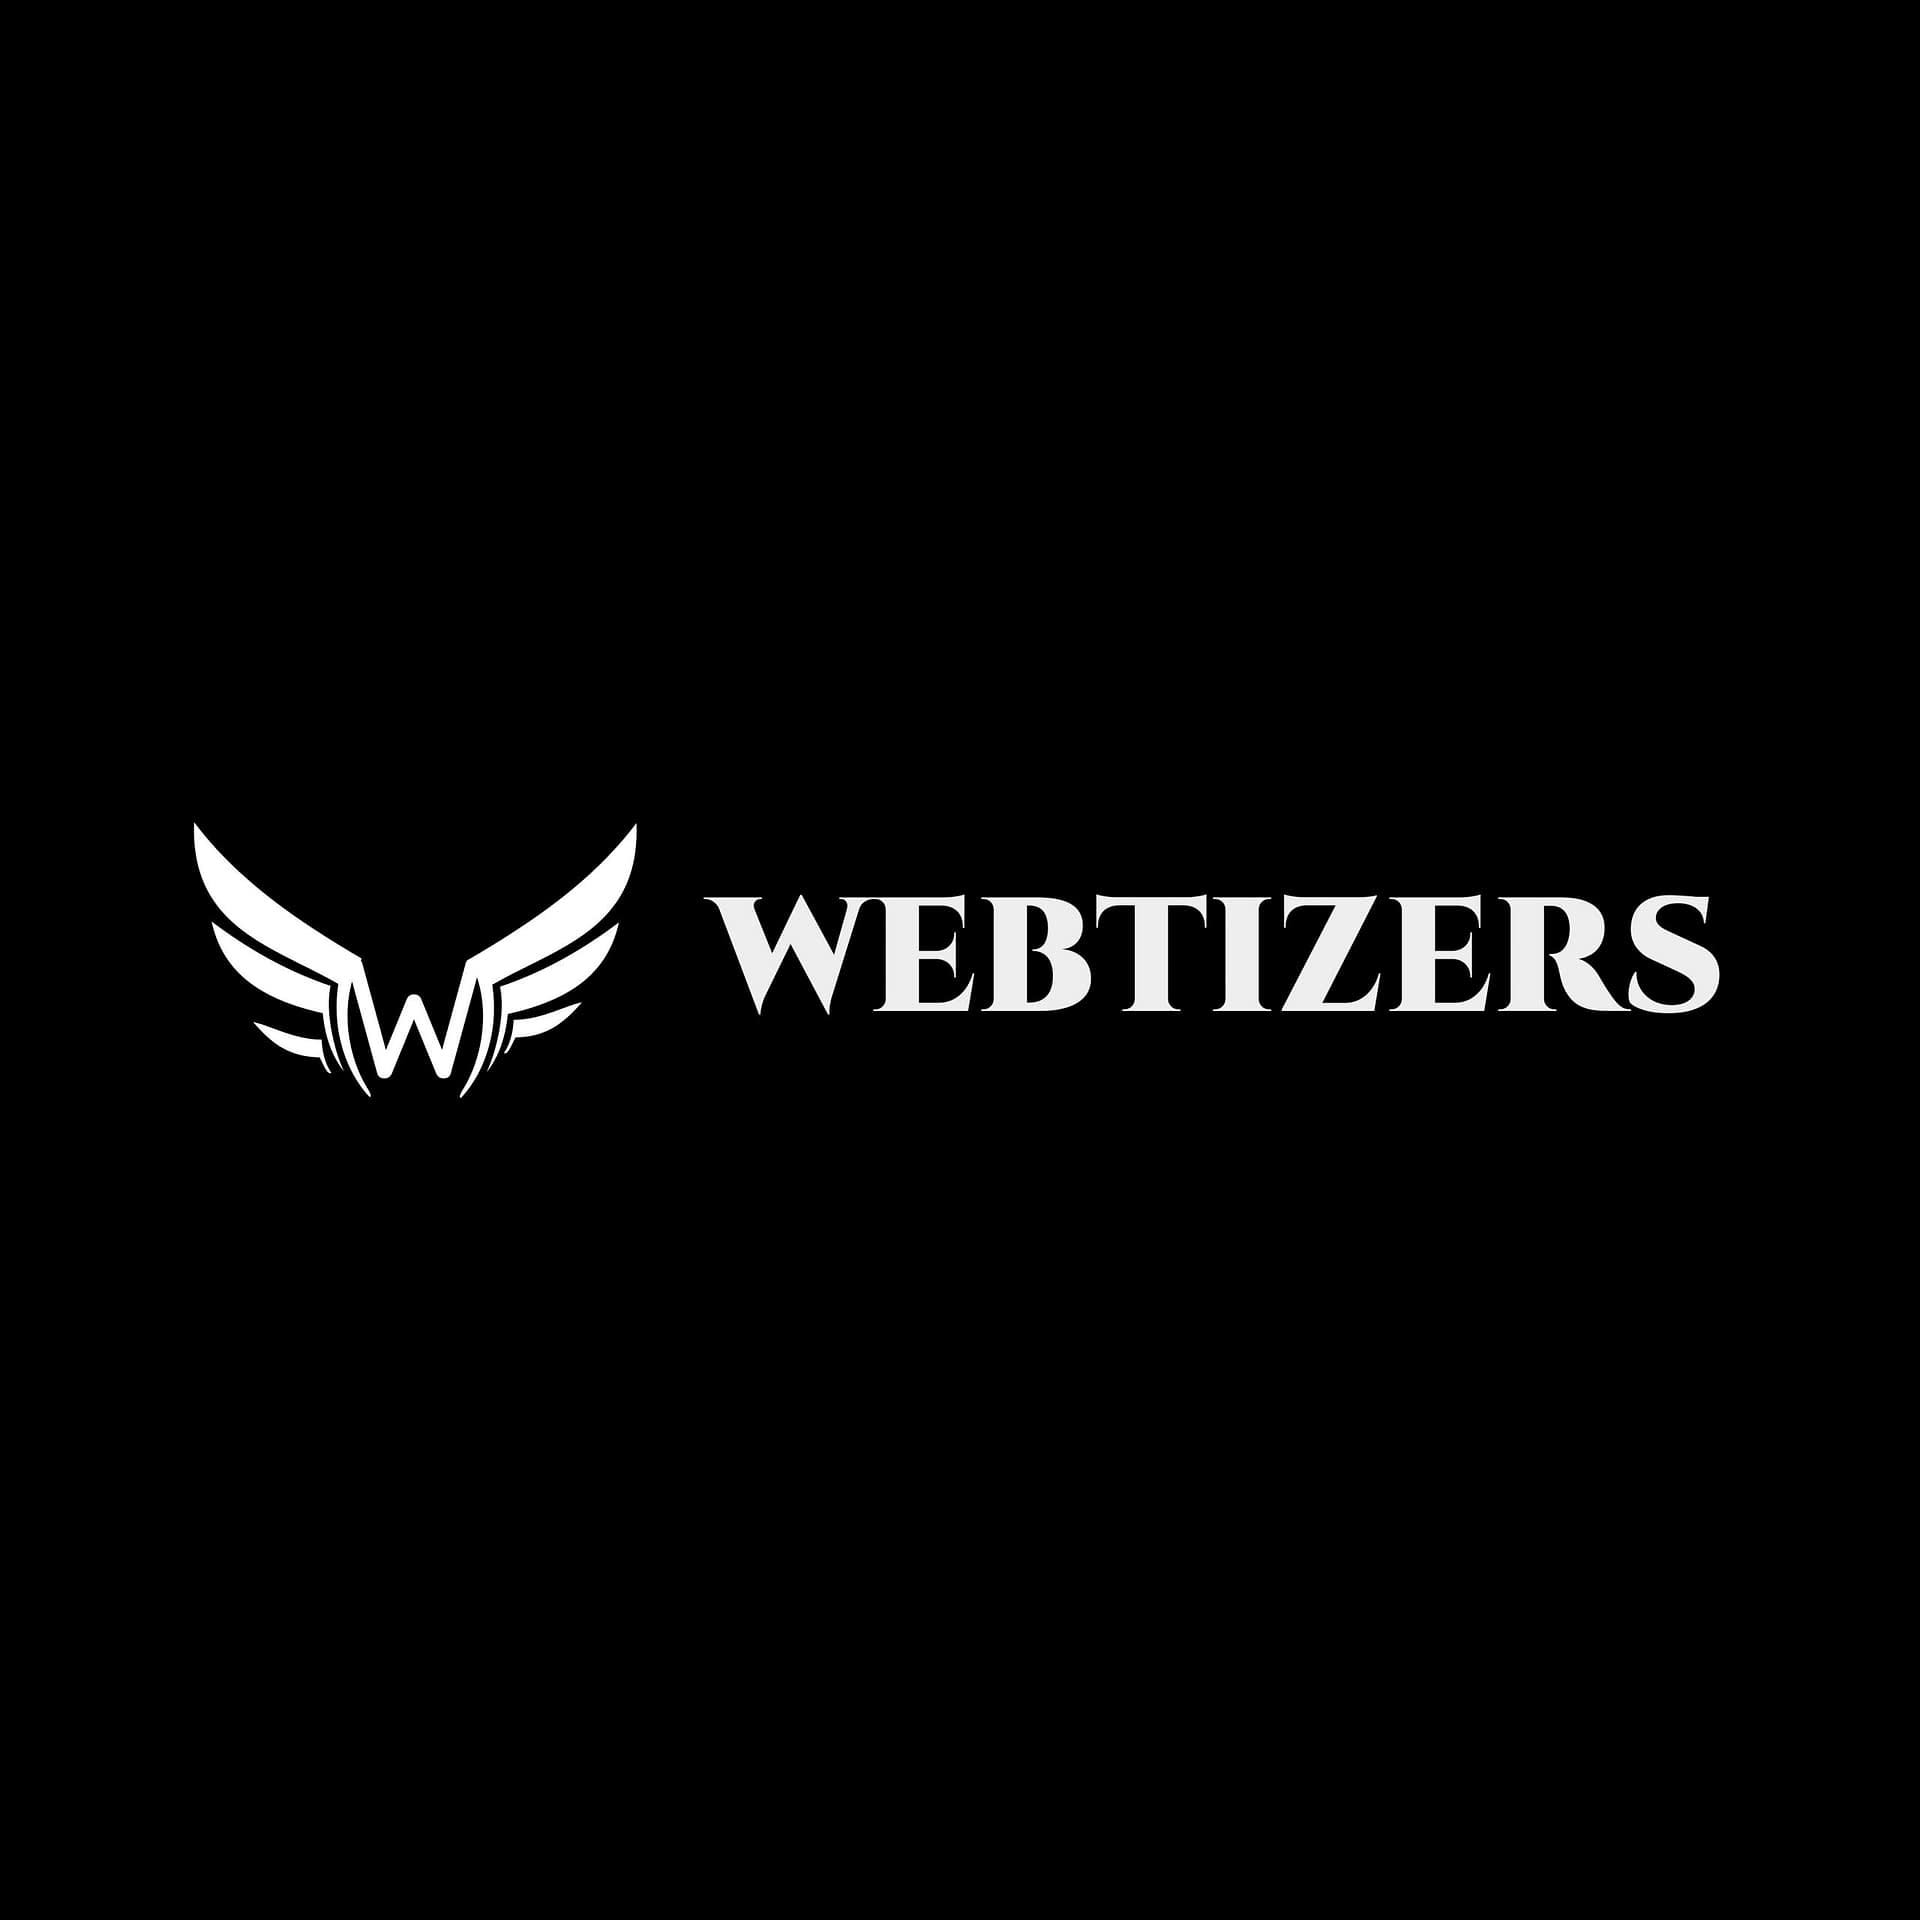 Webtizers